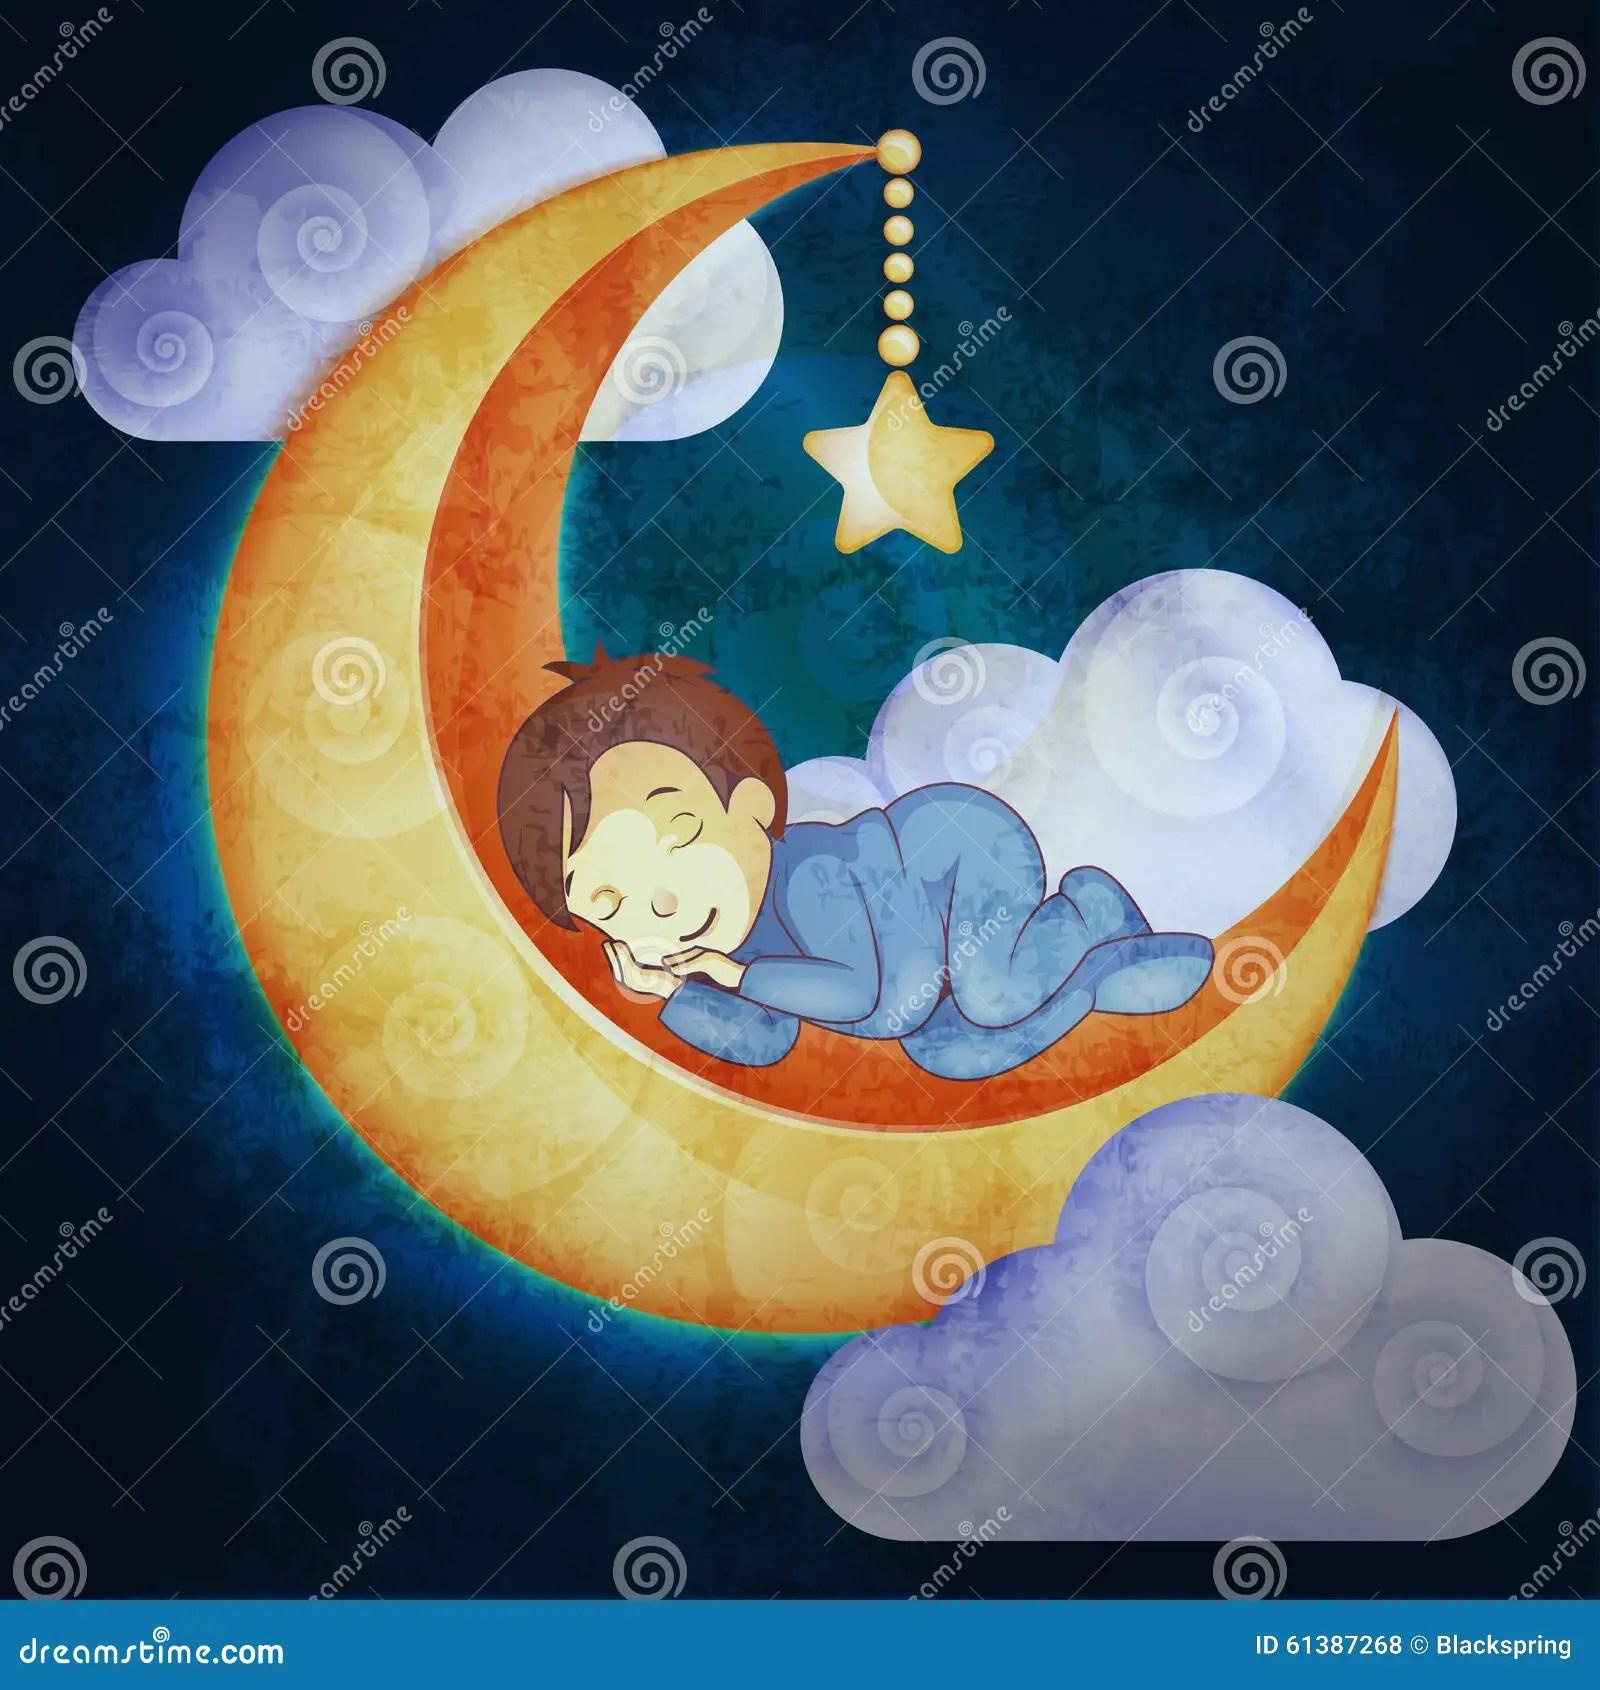 Little Cute Baby Girl Wallpaper Little Boy Sleeping On The Moon Stock Vector Image 61387268